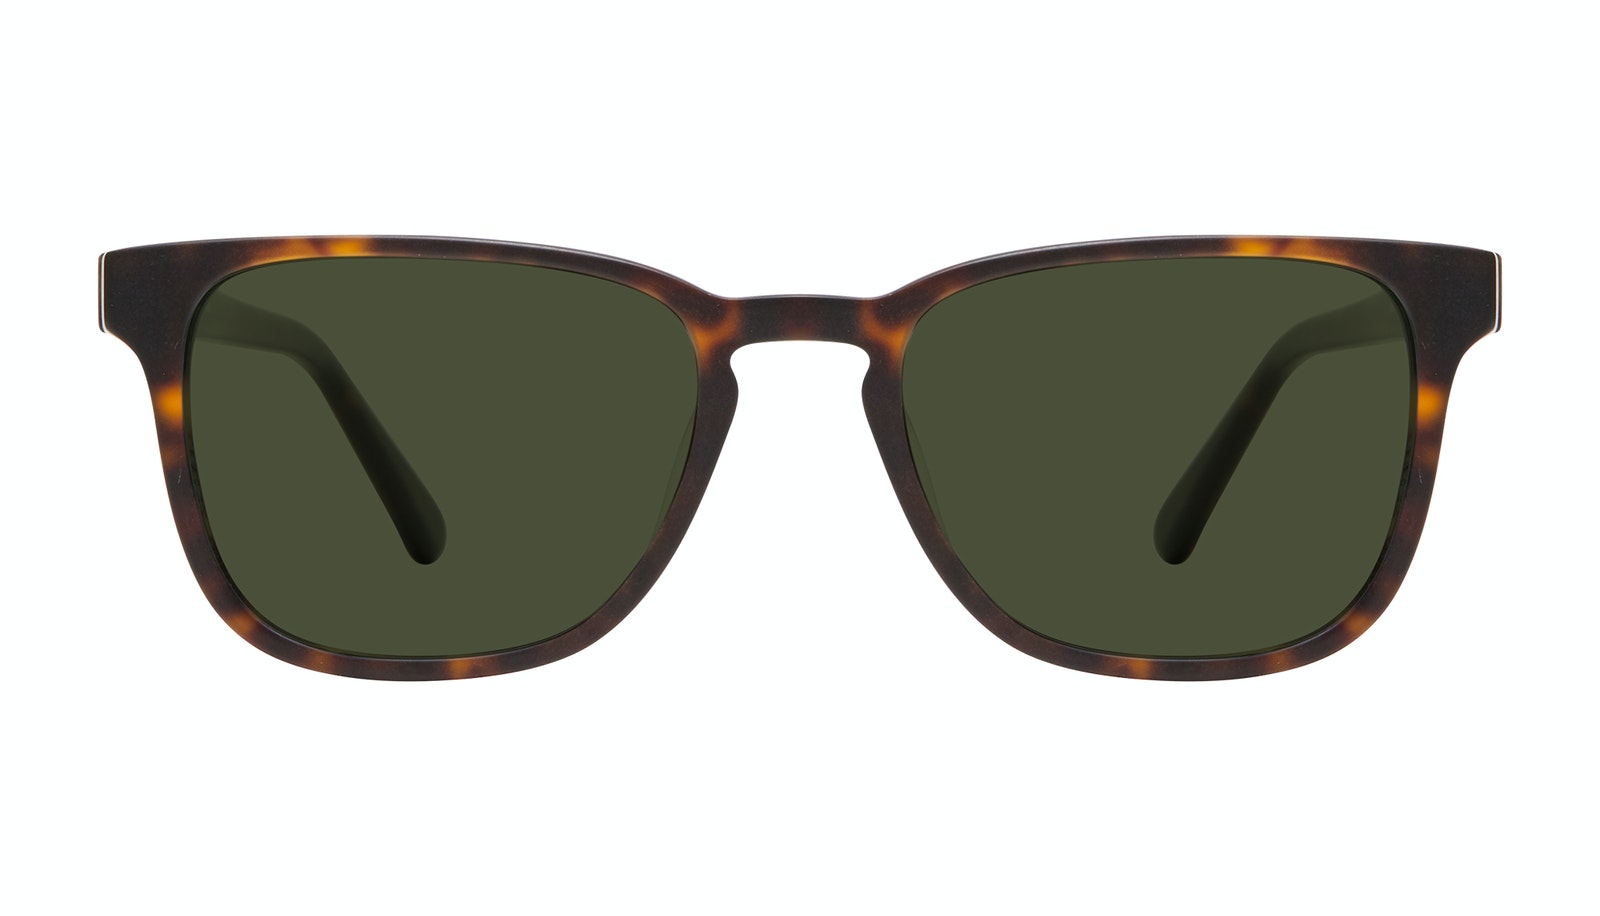 Affordable Fashion Glasses Square Sunglasses Men Kim Matte Tortoise